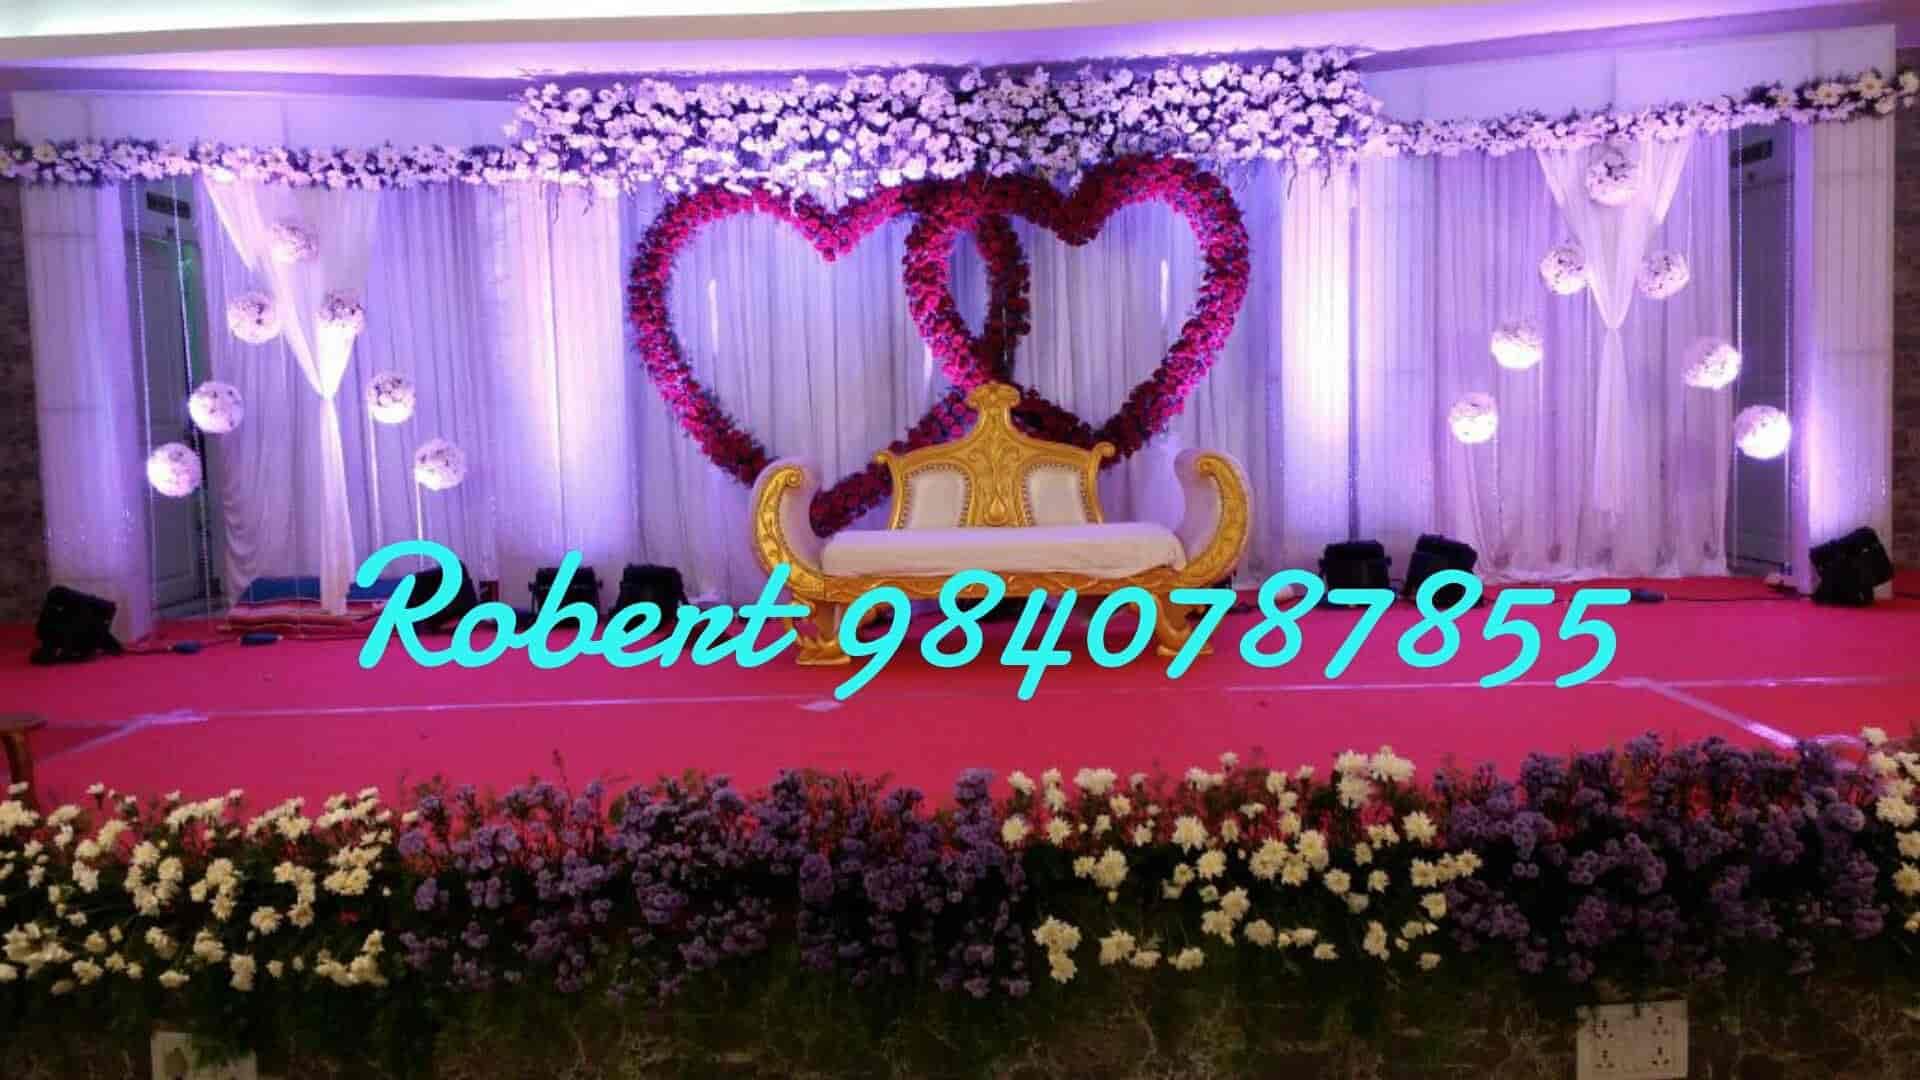 New annai decorations pushpa nagar nungambakkam wedding new annai decorations pushpa nagar nungambakkam wedding decorators in chennai justdial junglespirit Choice Image